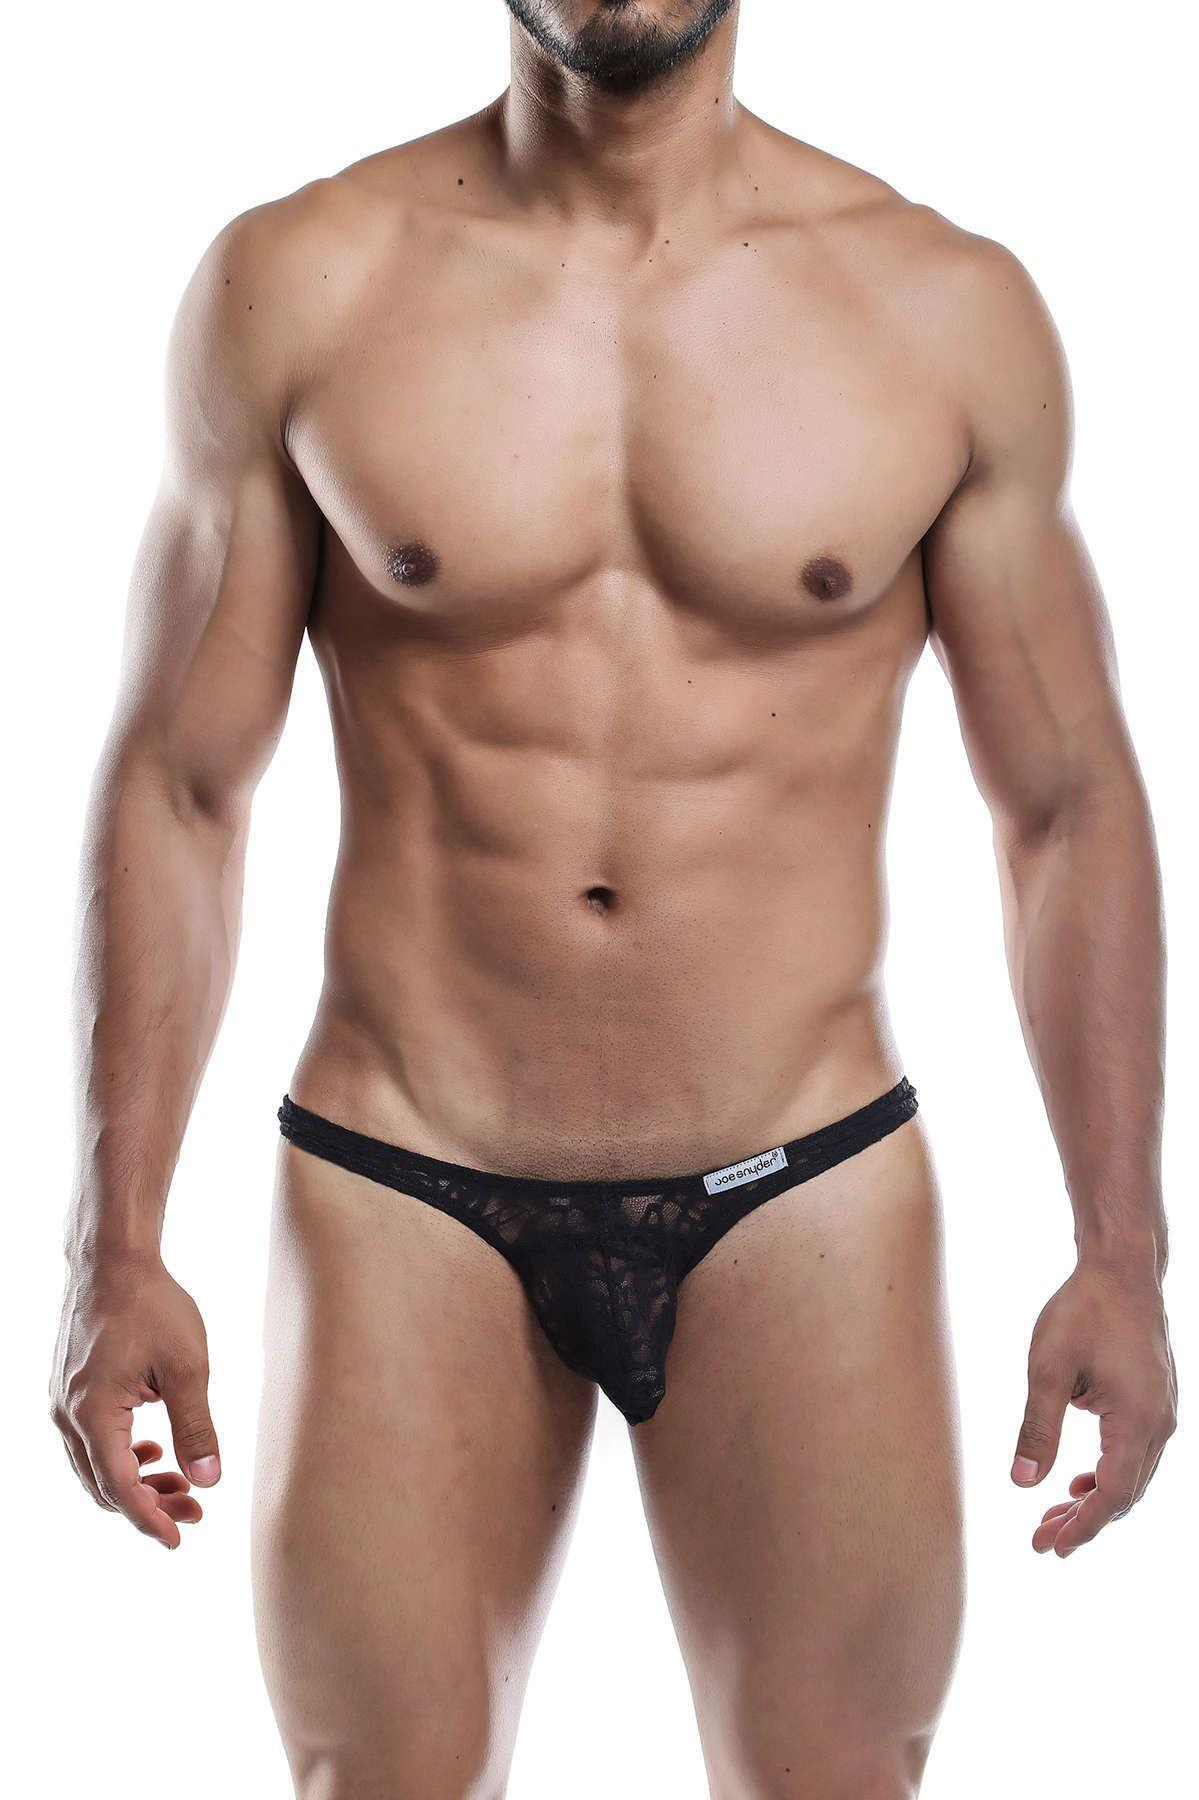 3a8626694ee7 Joe Snyder Men's Thong Maxi Bulge 06 | eBay